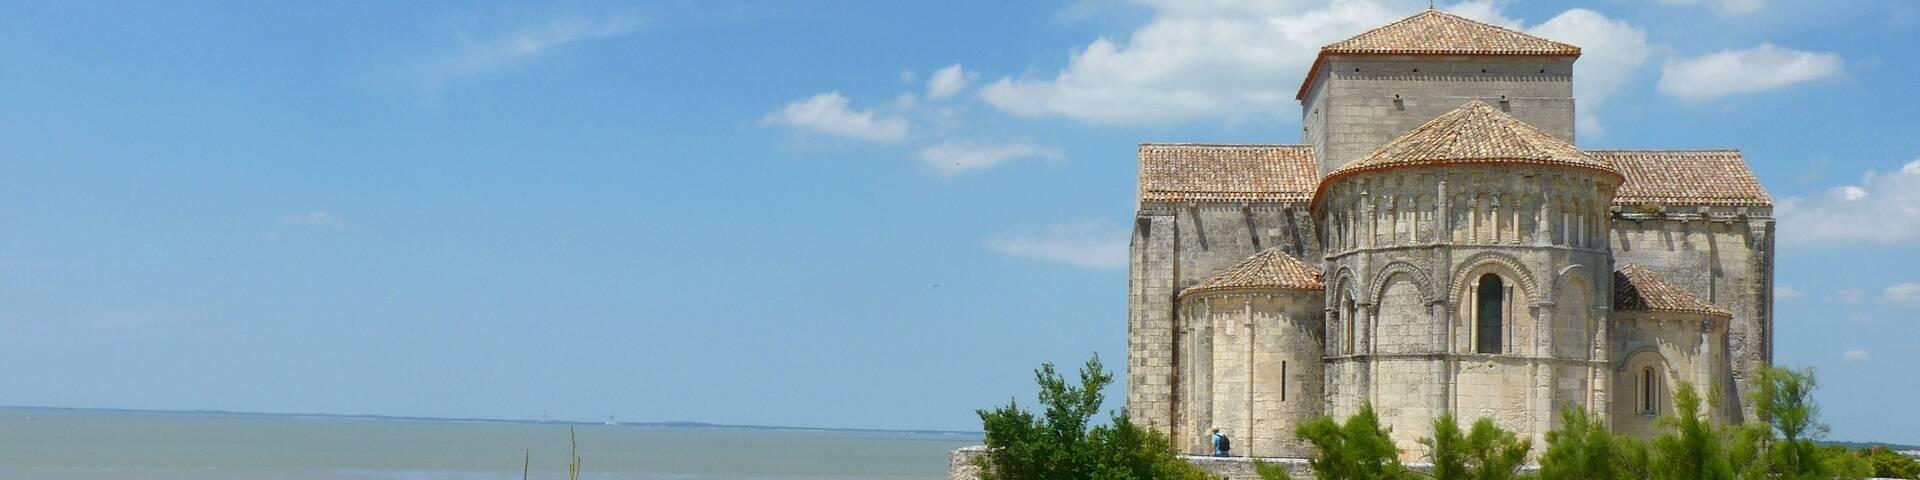 Sainte-Radegonde kerk van Talmont - ©P.Migaud / FDHPA17